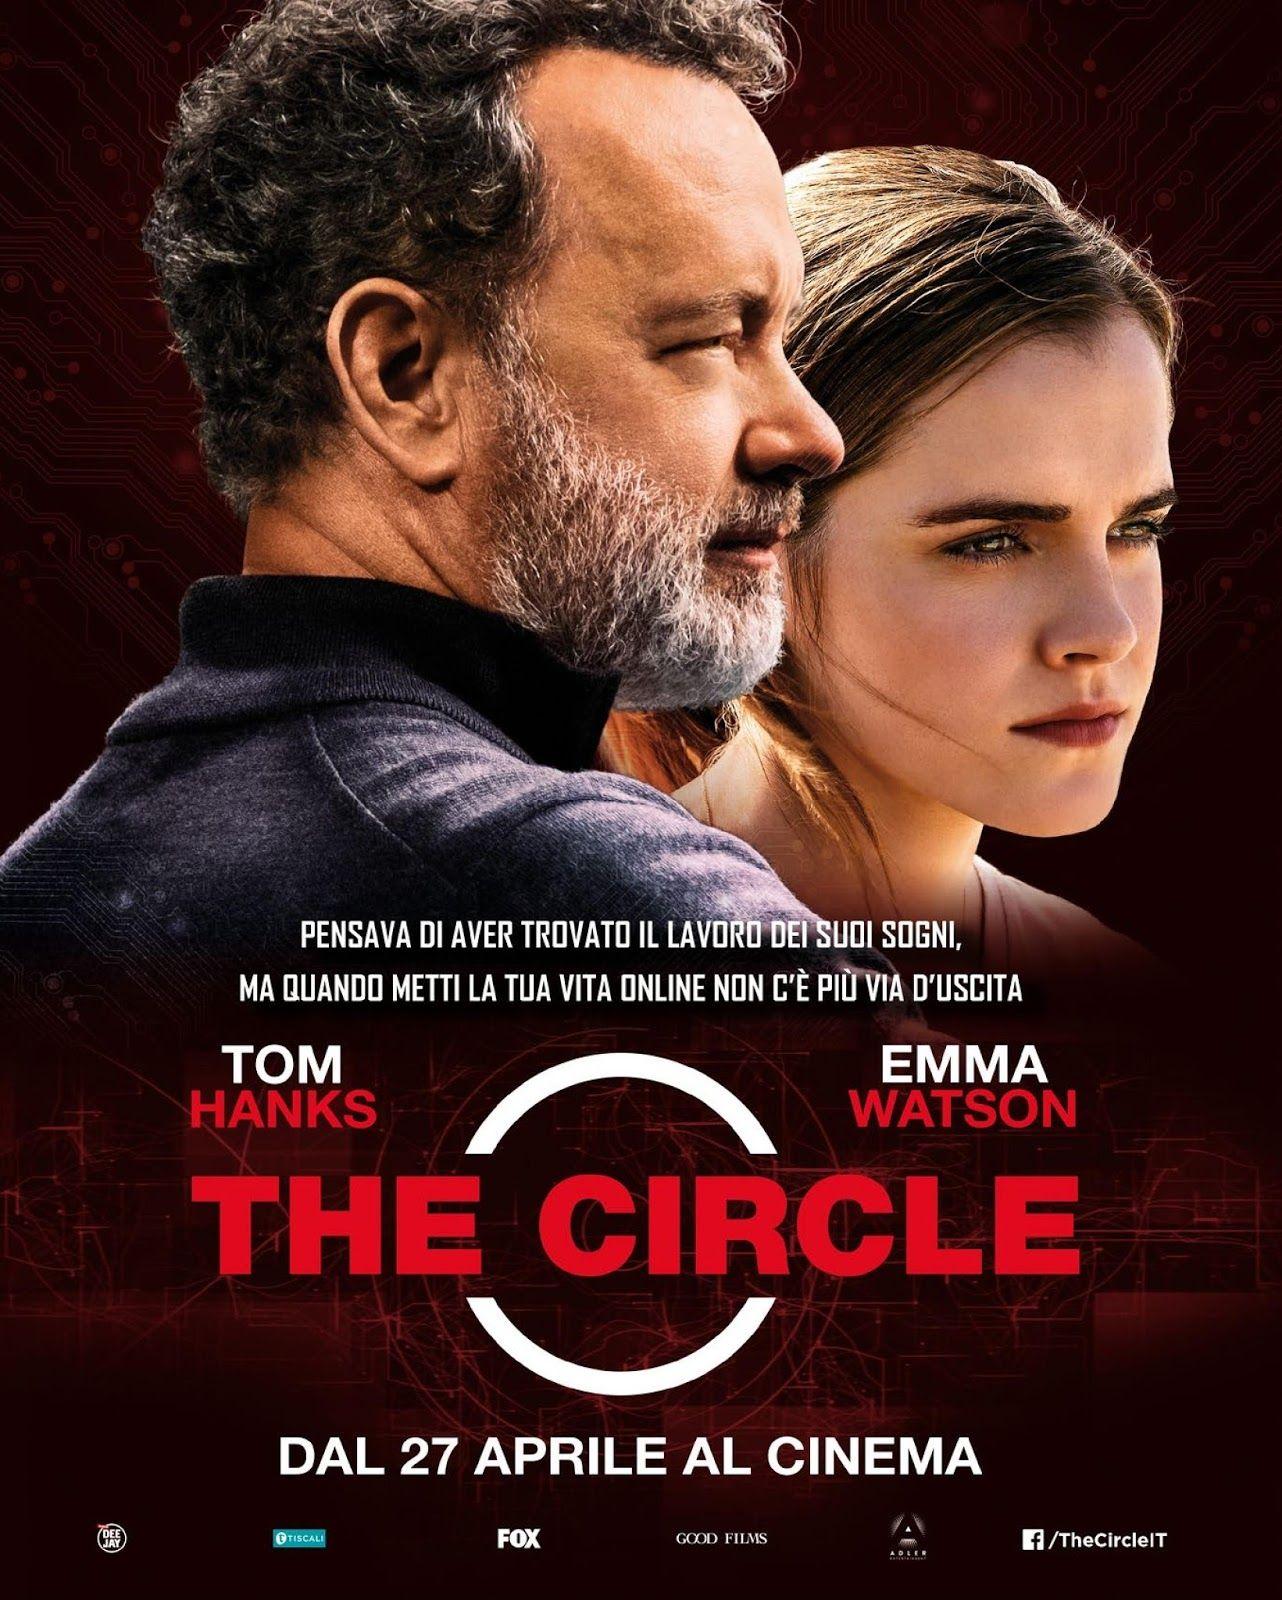 The Circle Movie Trailer Circle Movie Free Movies Online Super Movie